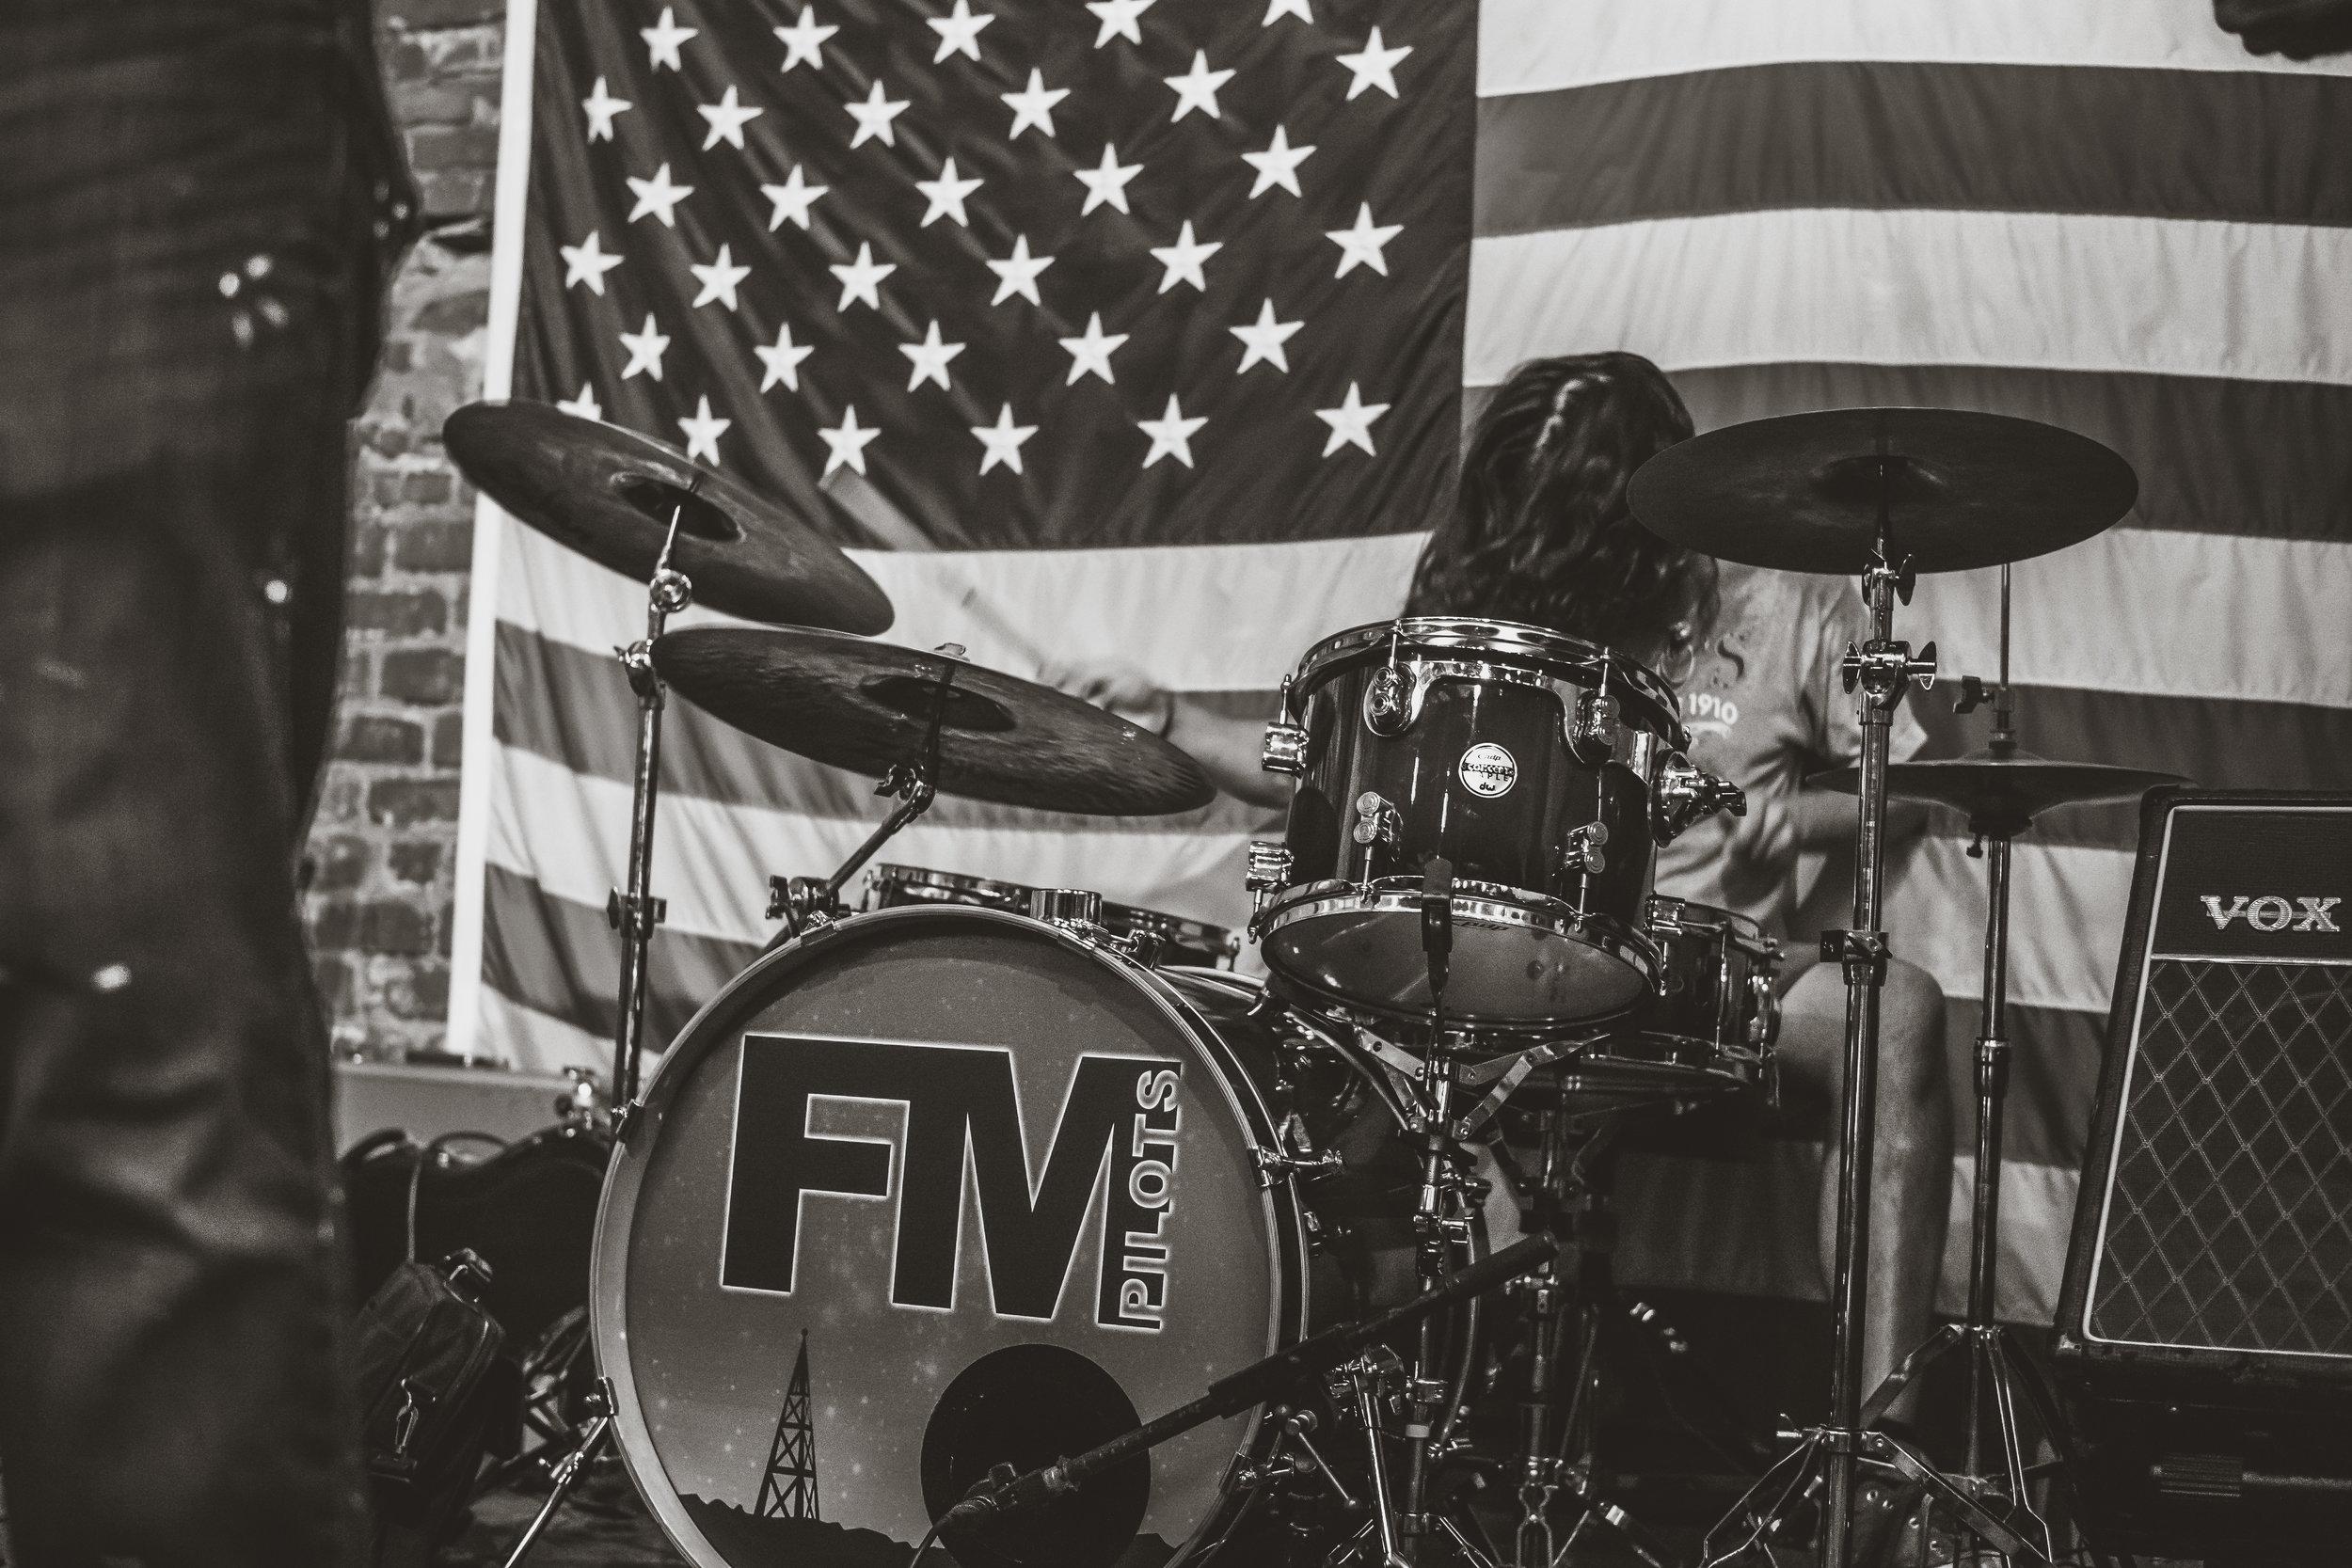 FM Pilots - Tulsa Rock Band - The Hunt Club Tulsa, OK 061016-14.jpg